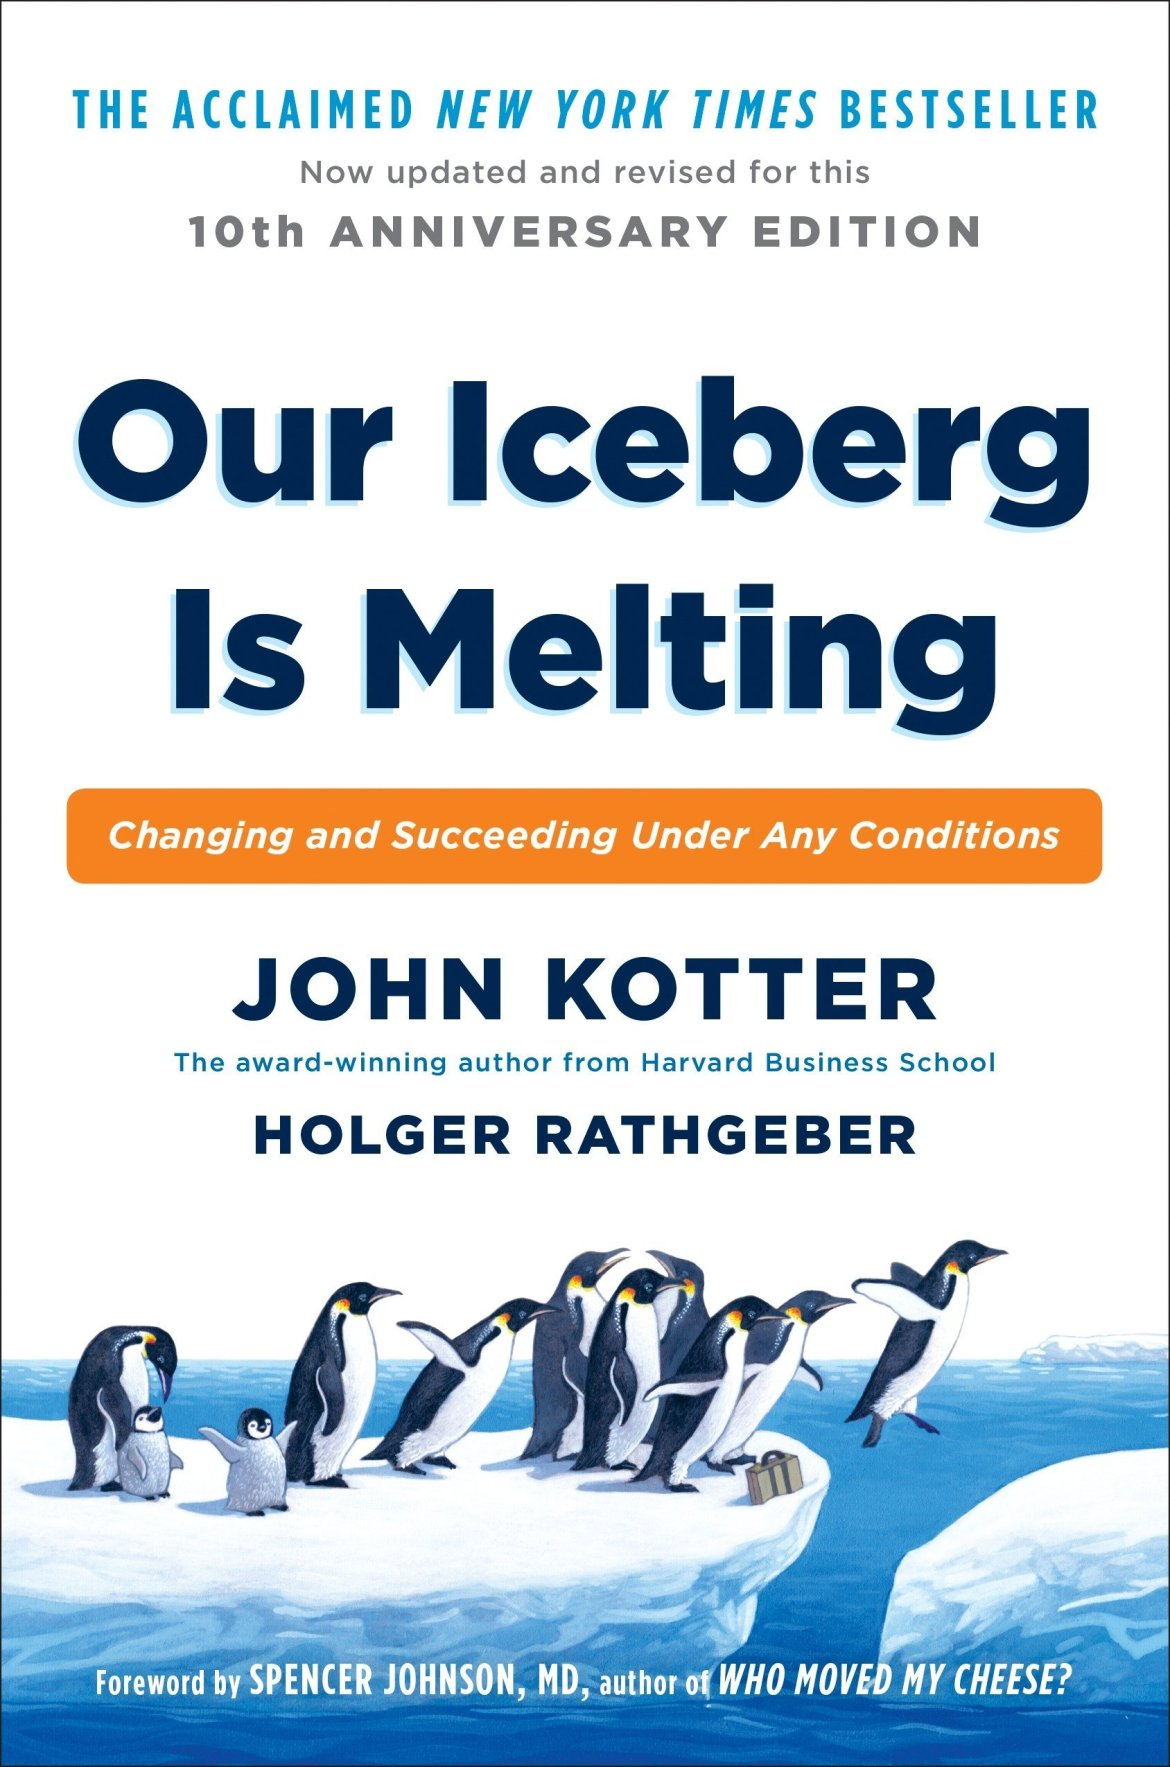 Image result for Our Iceberg is Melting - John Kotter & Holger Rathgeber